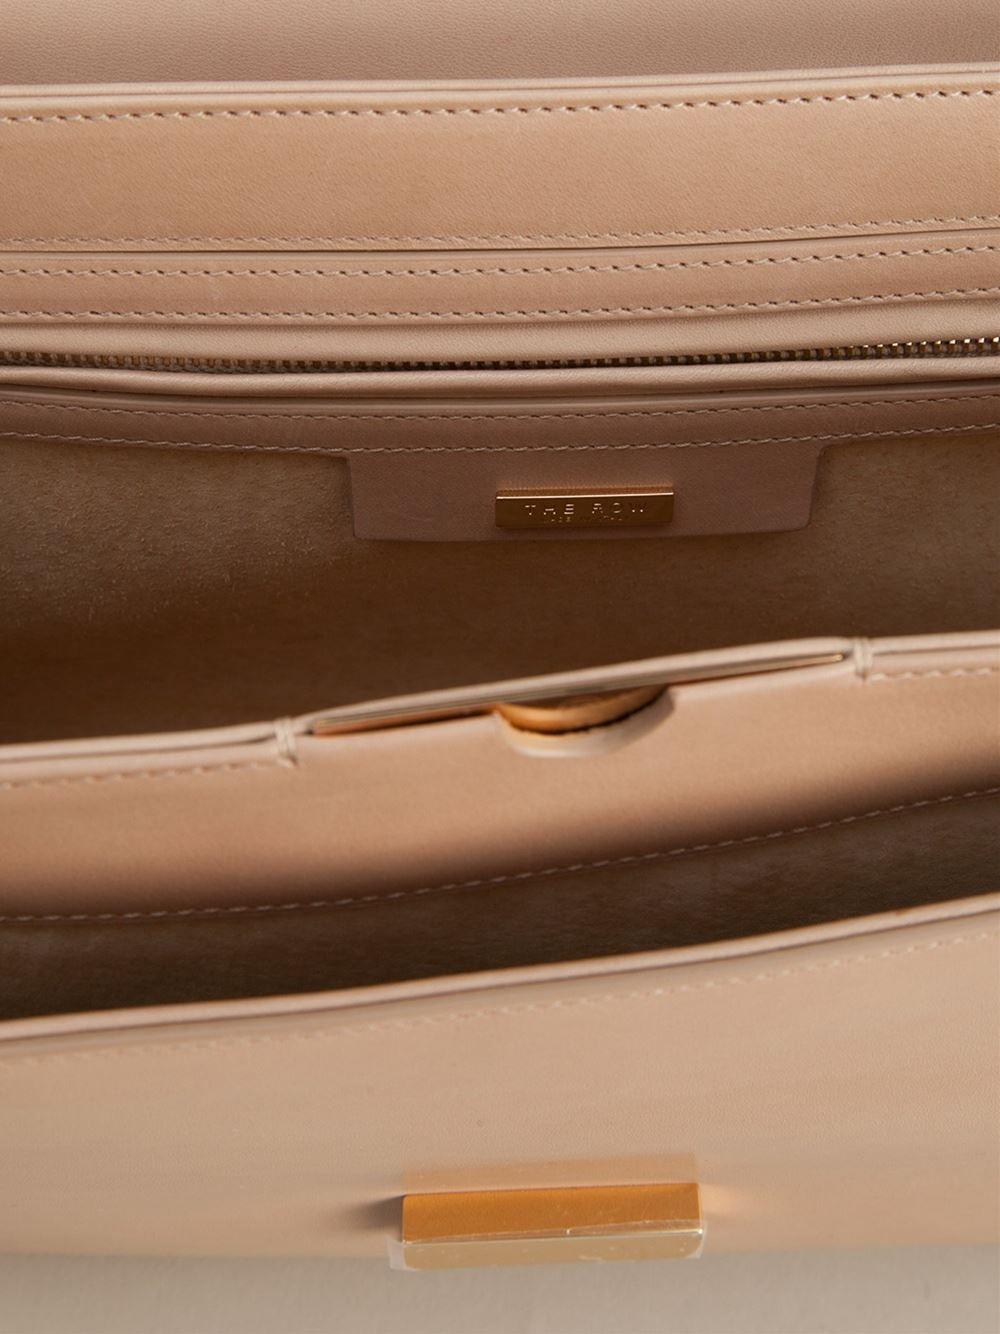 http://www.farfetch.com/shopping/women/the-row-book-bag-item-10863882.aspx?storeid=9467